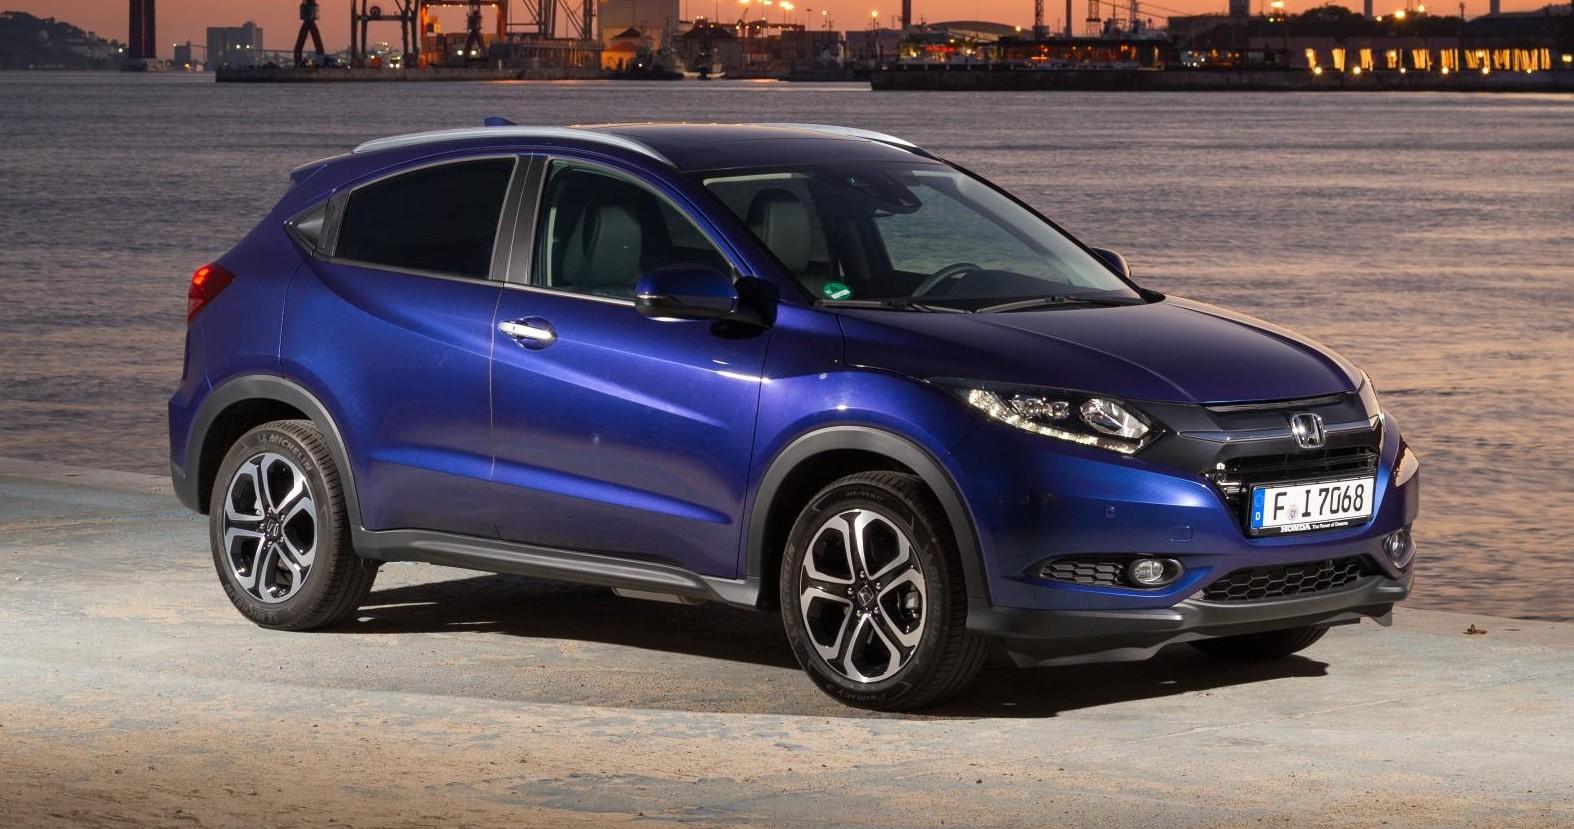 New Honda Hrv >> 2015 HONDA HR-V - myAutoWorld.com